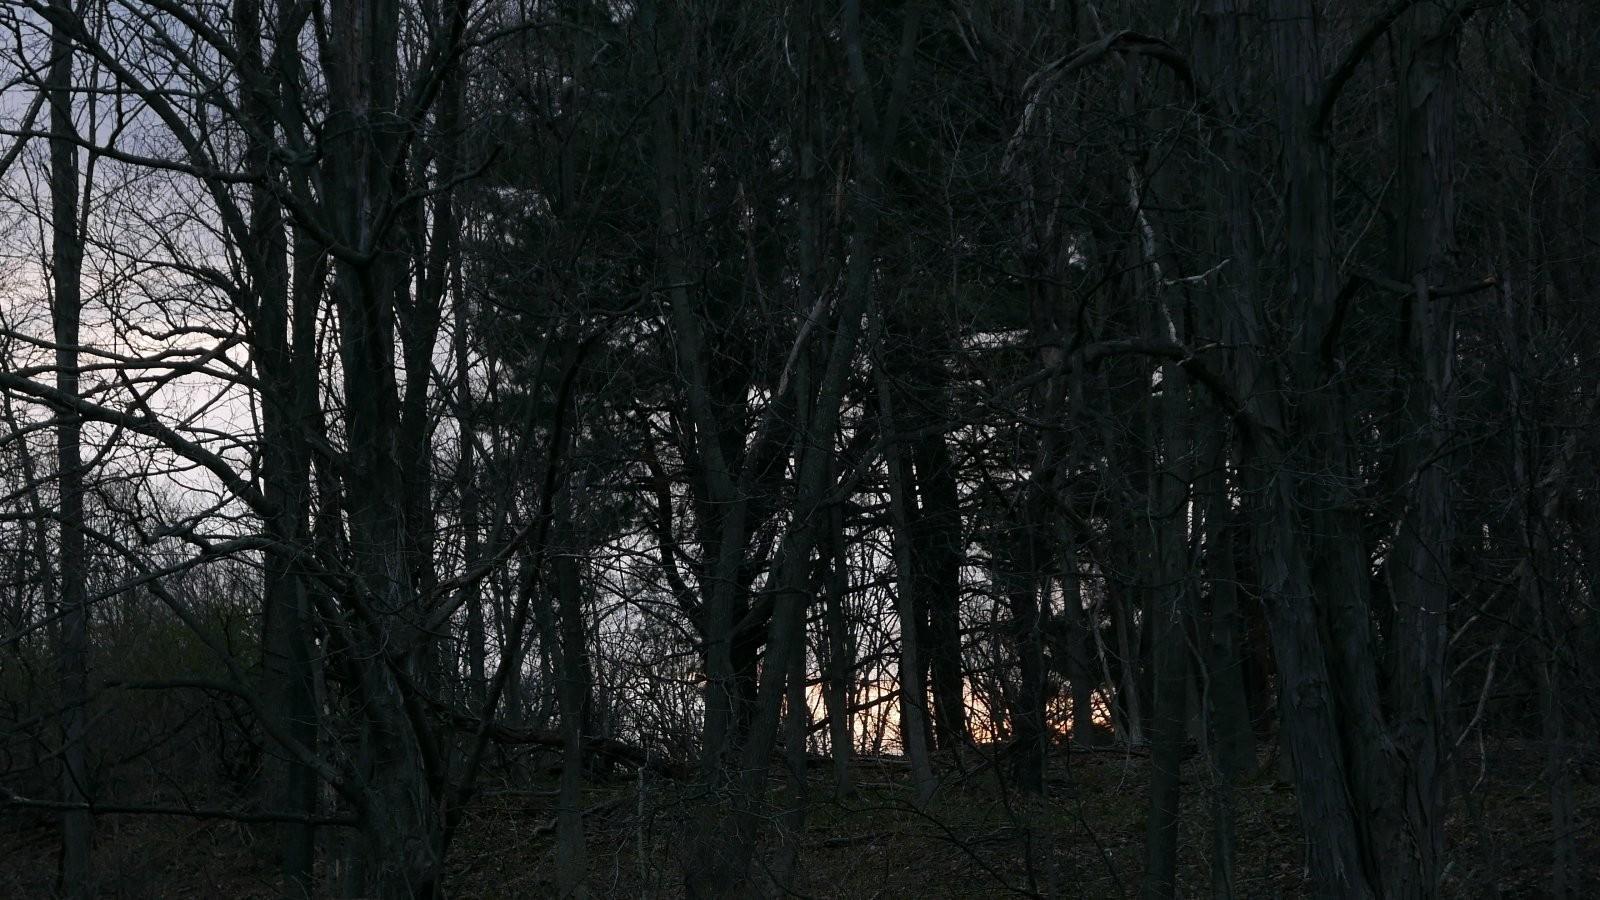 LX100 sunrise through trees (2).JPG